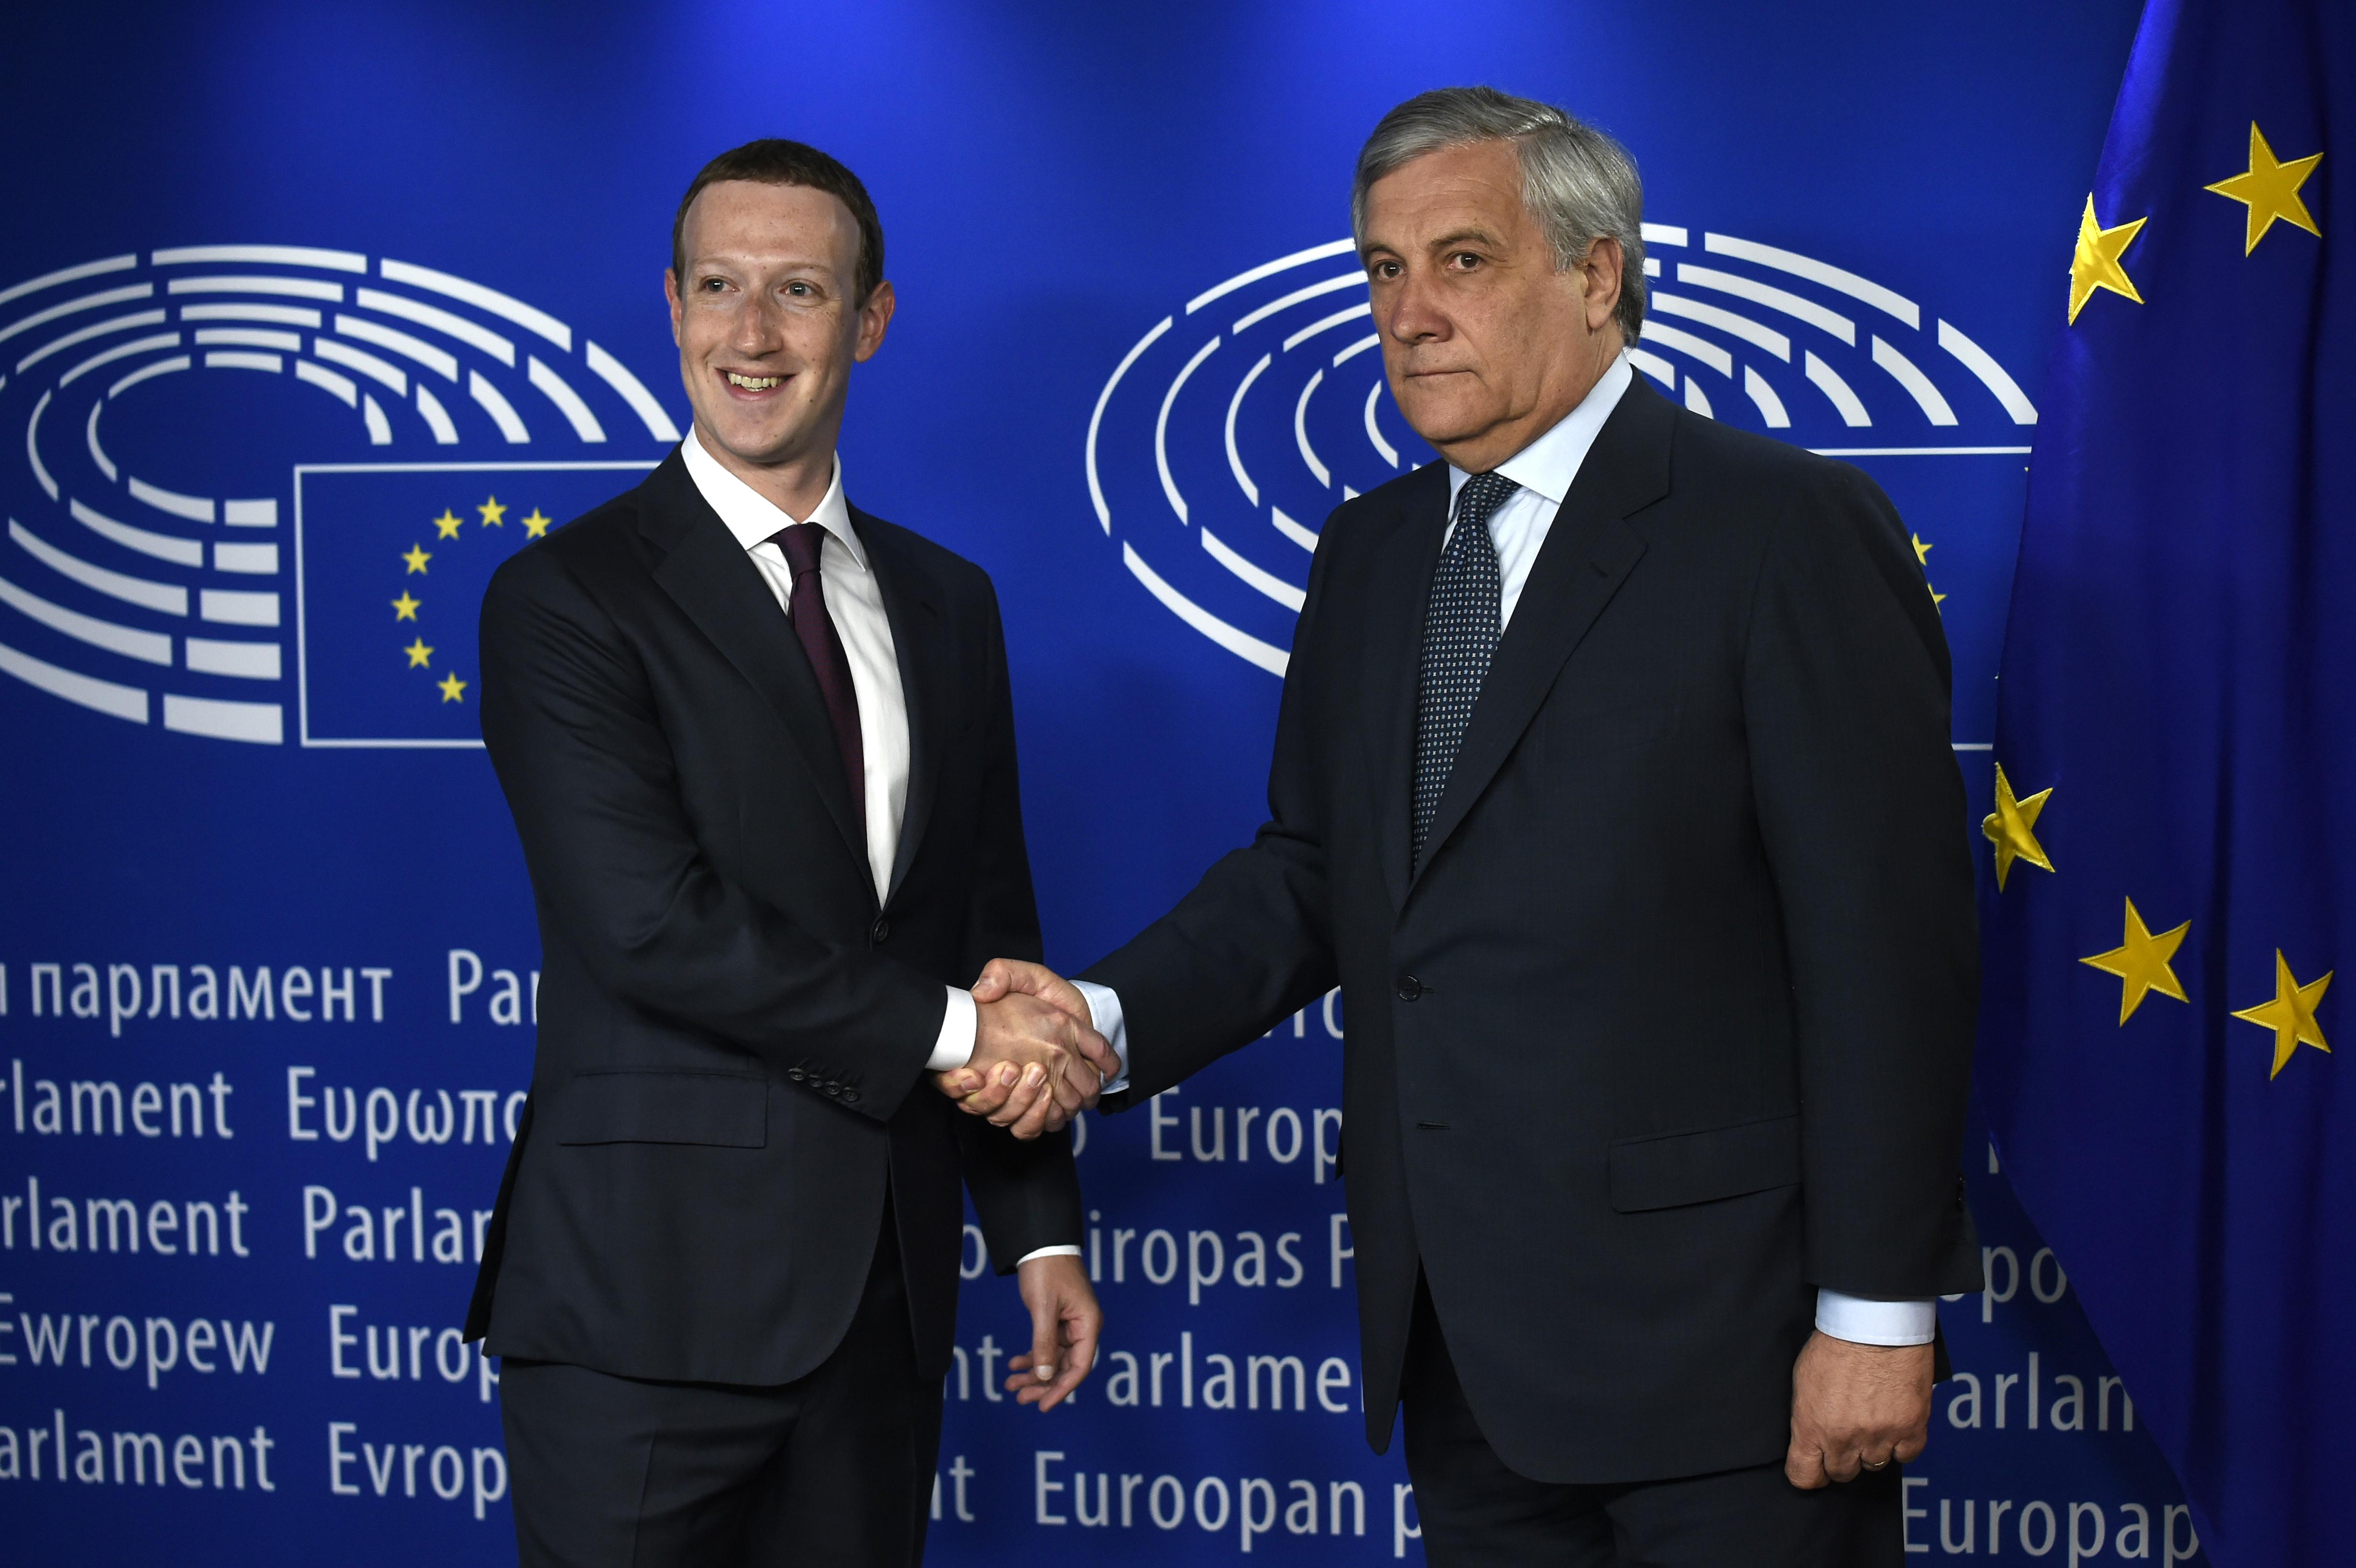 Mark Zuckerberg junto al presidente del Parlamento Europeo, Antonio Tajani | John Thys | Agence France-Presse